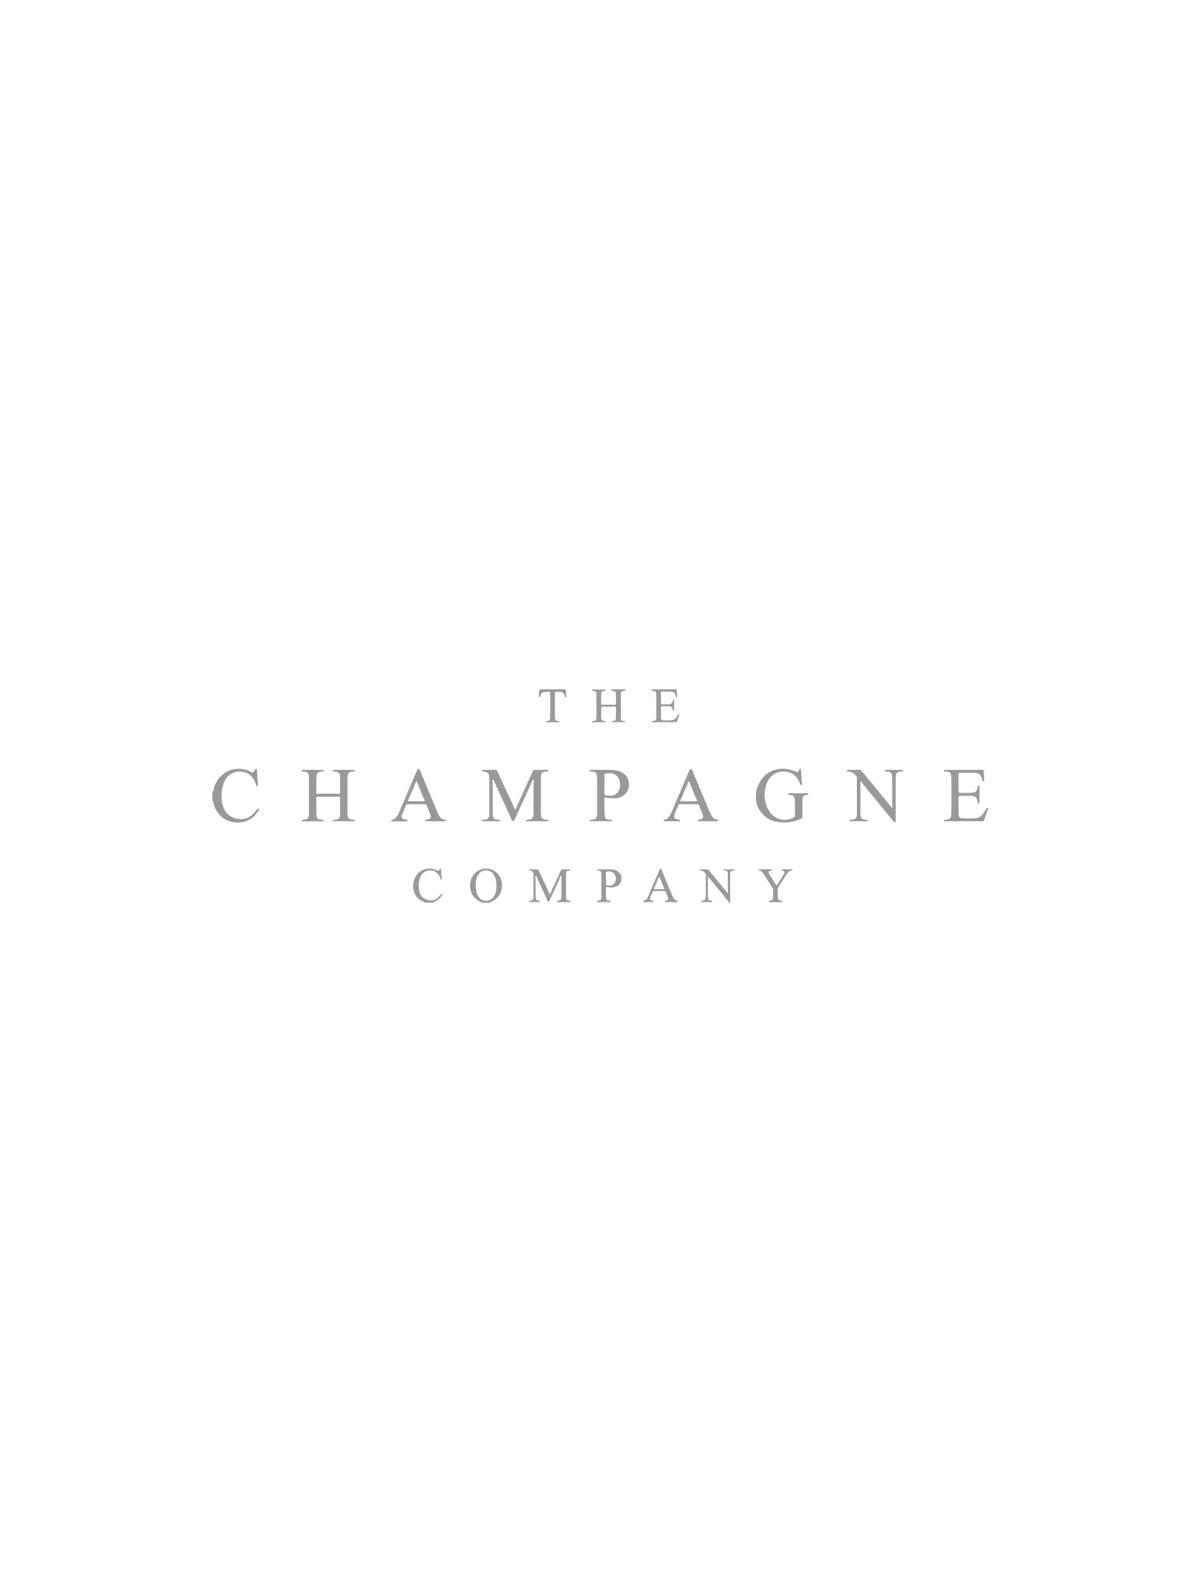 Ardbeg Dark Cove Islay Single Malt Scotch Whisky 70cl Limited Edition